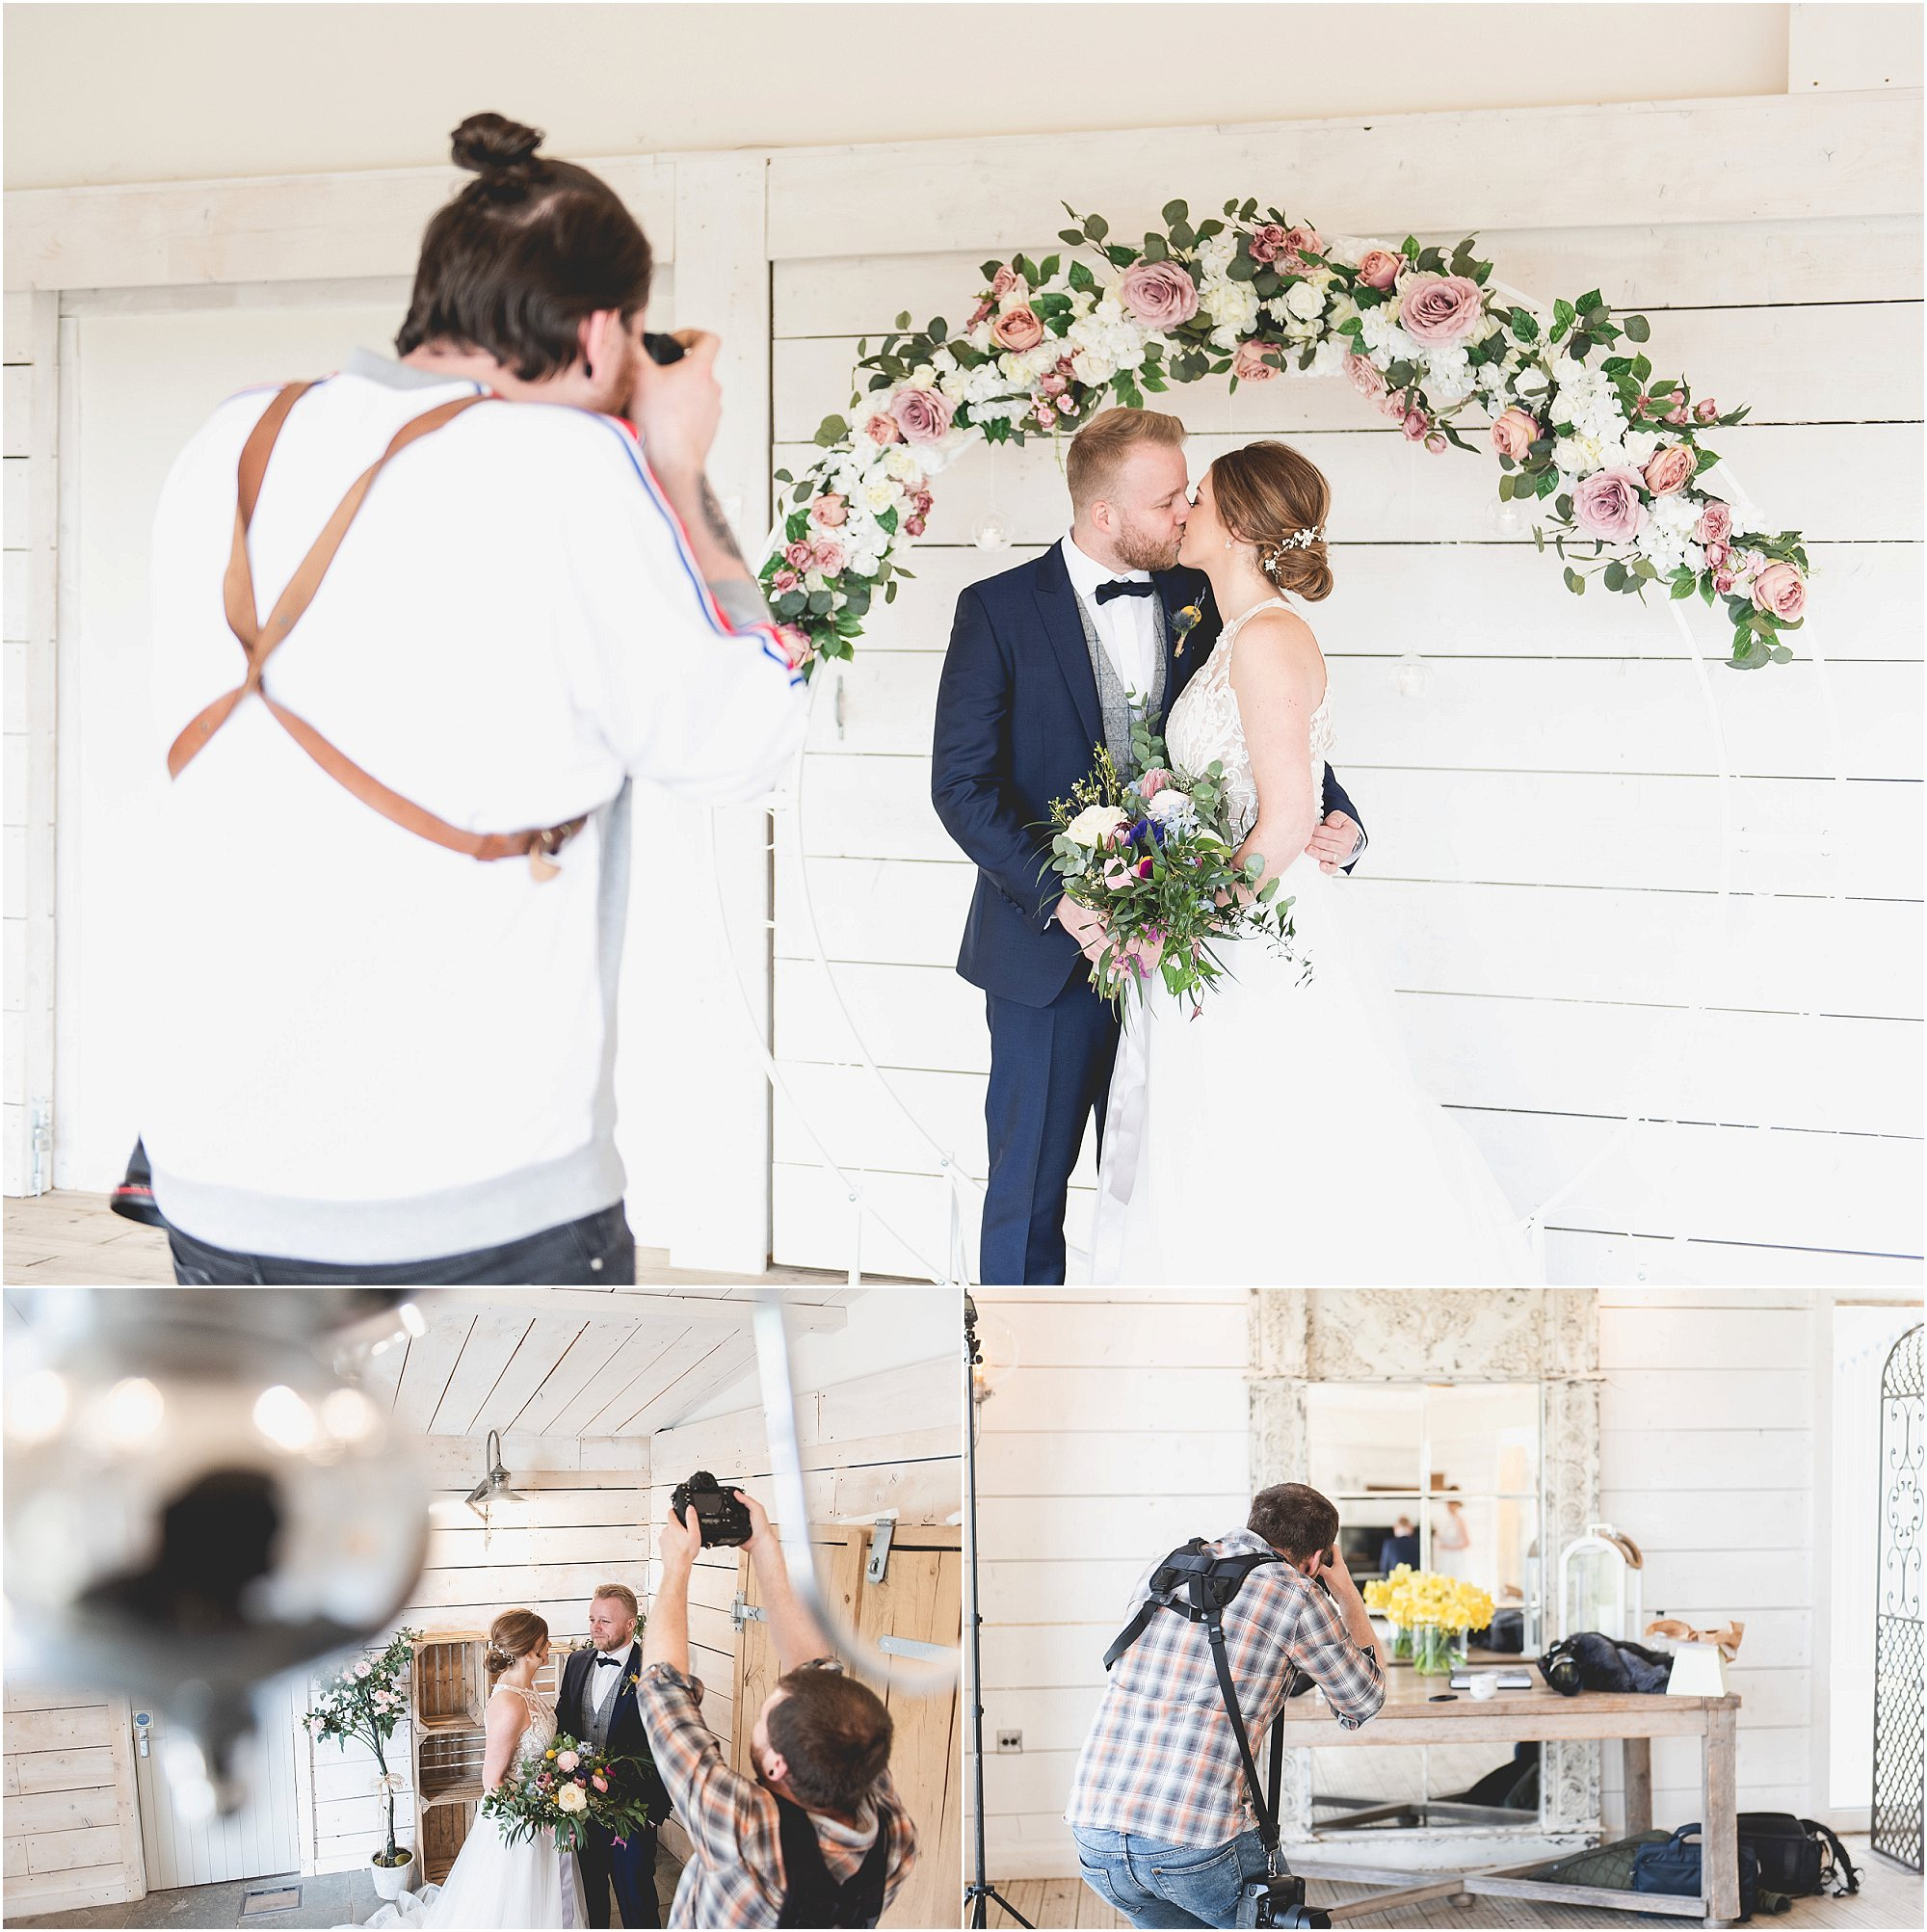 Creative Wedding Photography at Bashall Barn